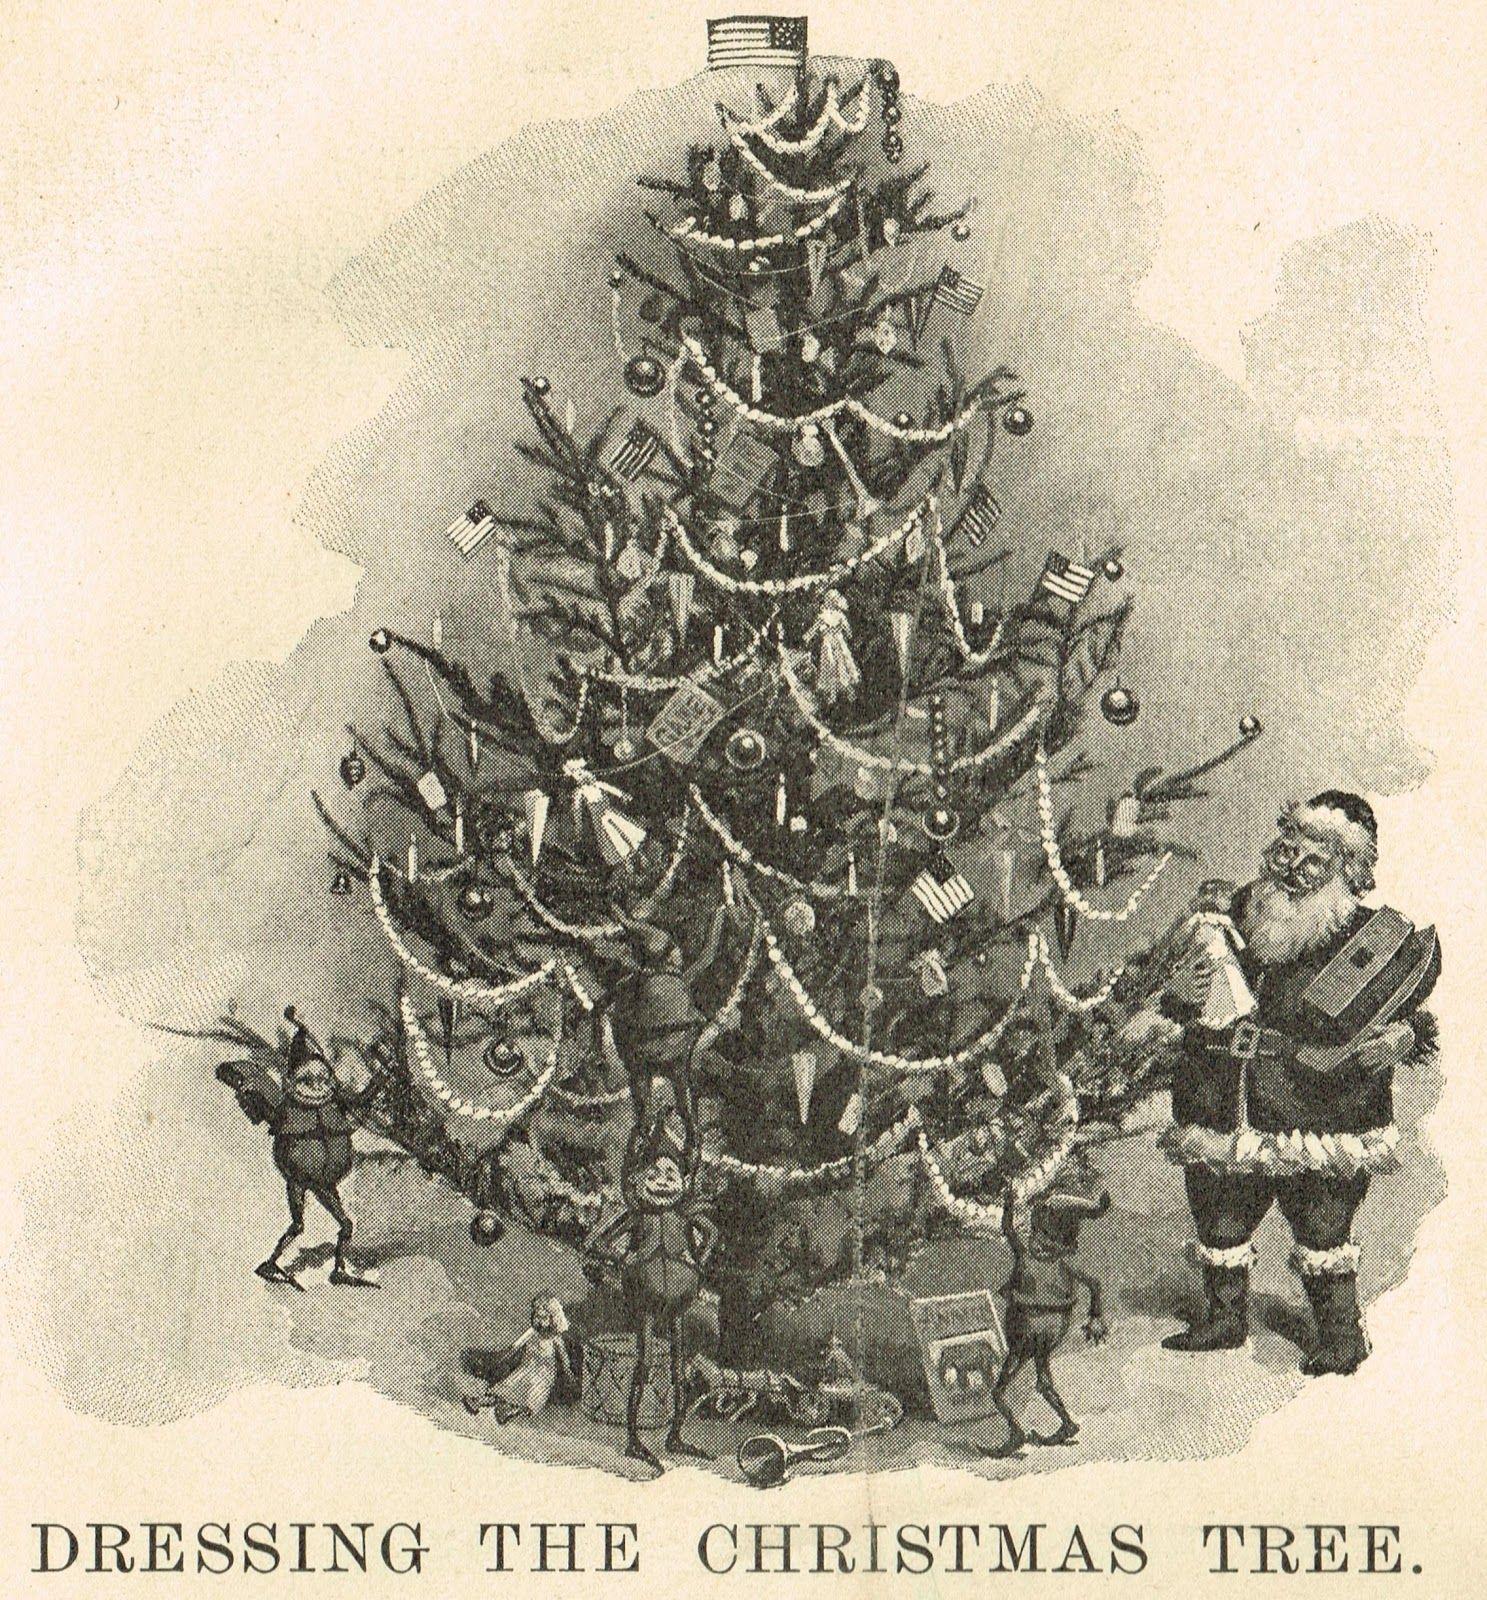 Antique Christmas Tree Printable Image